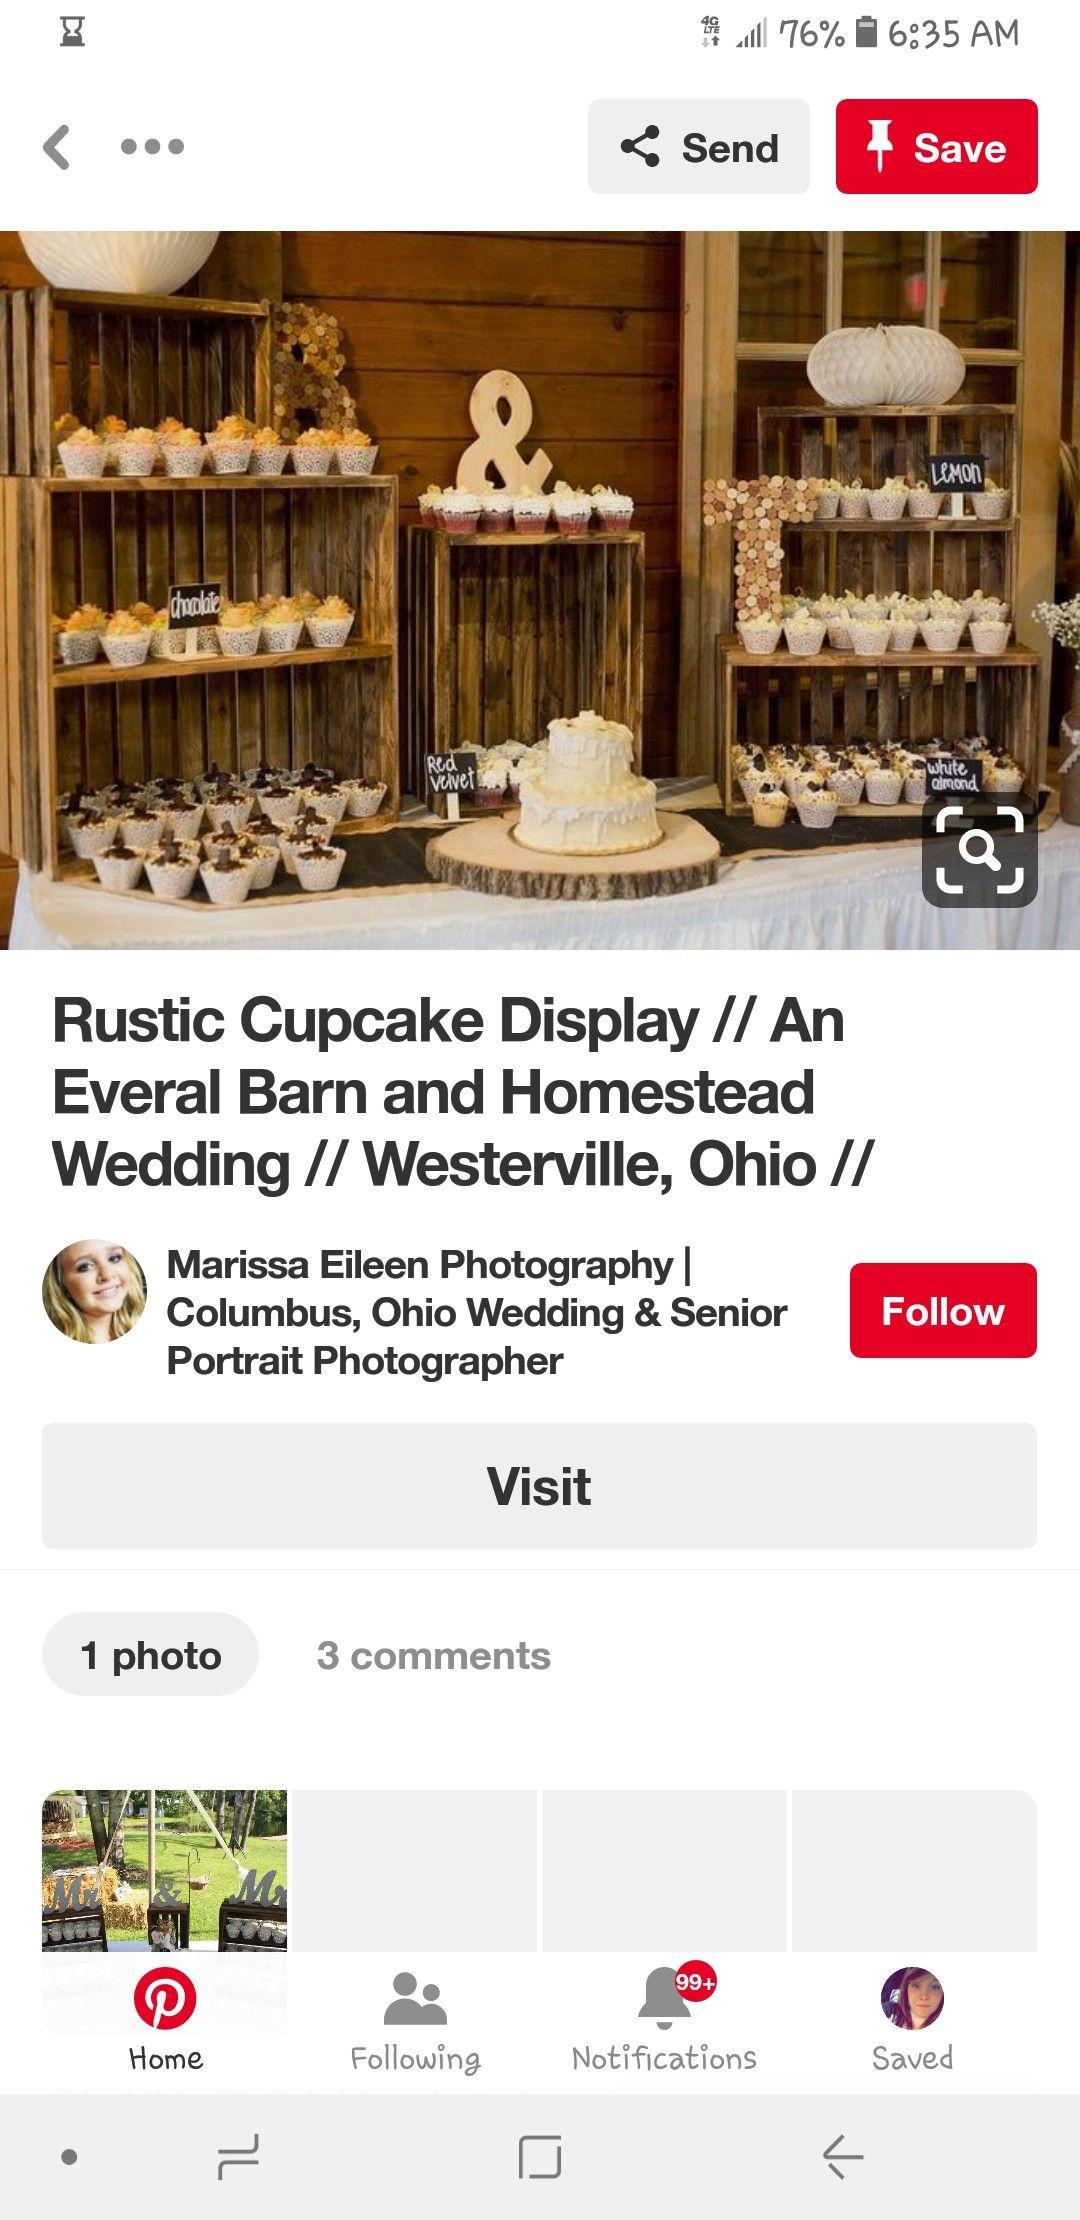 Pin by Amber Kamischke on My Wedding Rustic cupcake